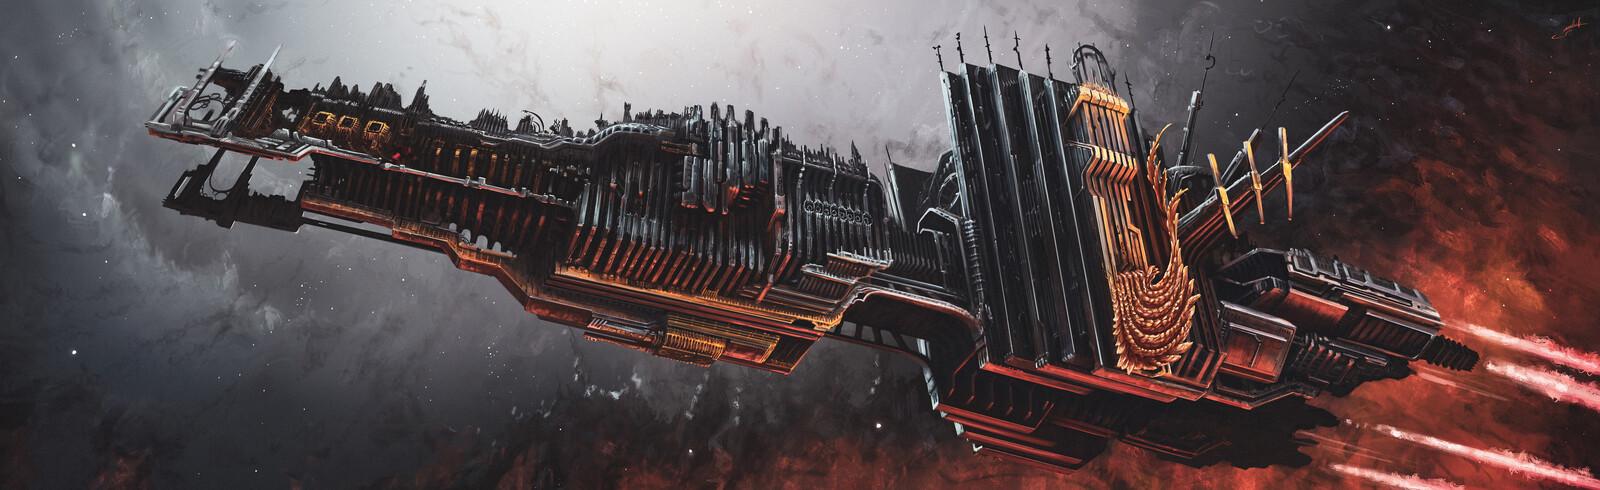 Ancient Epic battleship